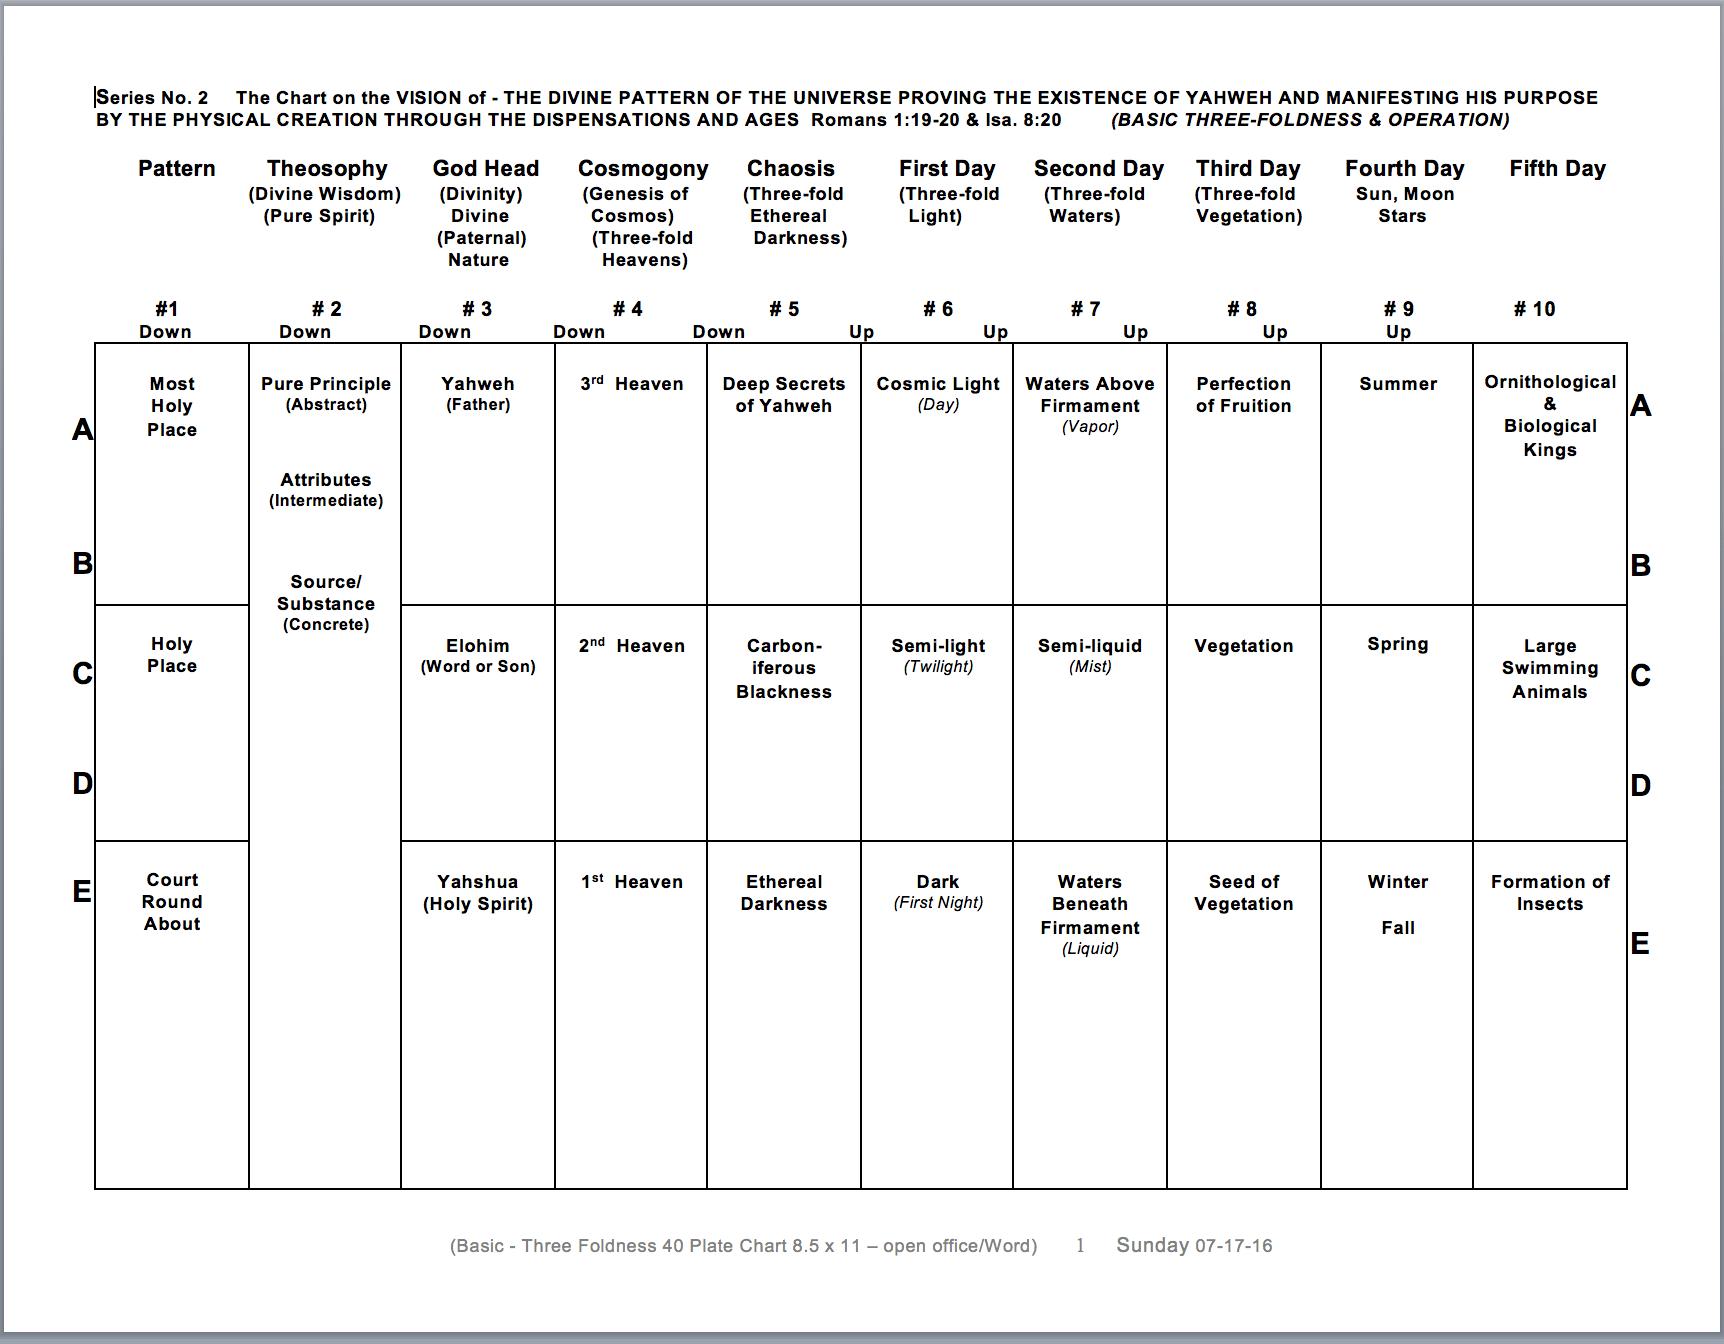 Basic 3-Fold Operation 40 Plate 1-10